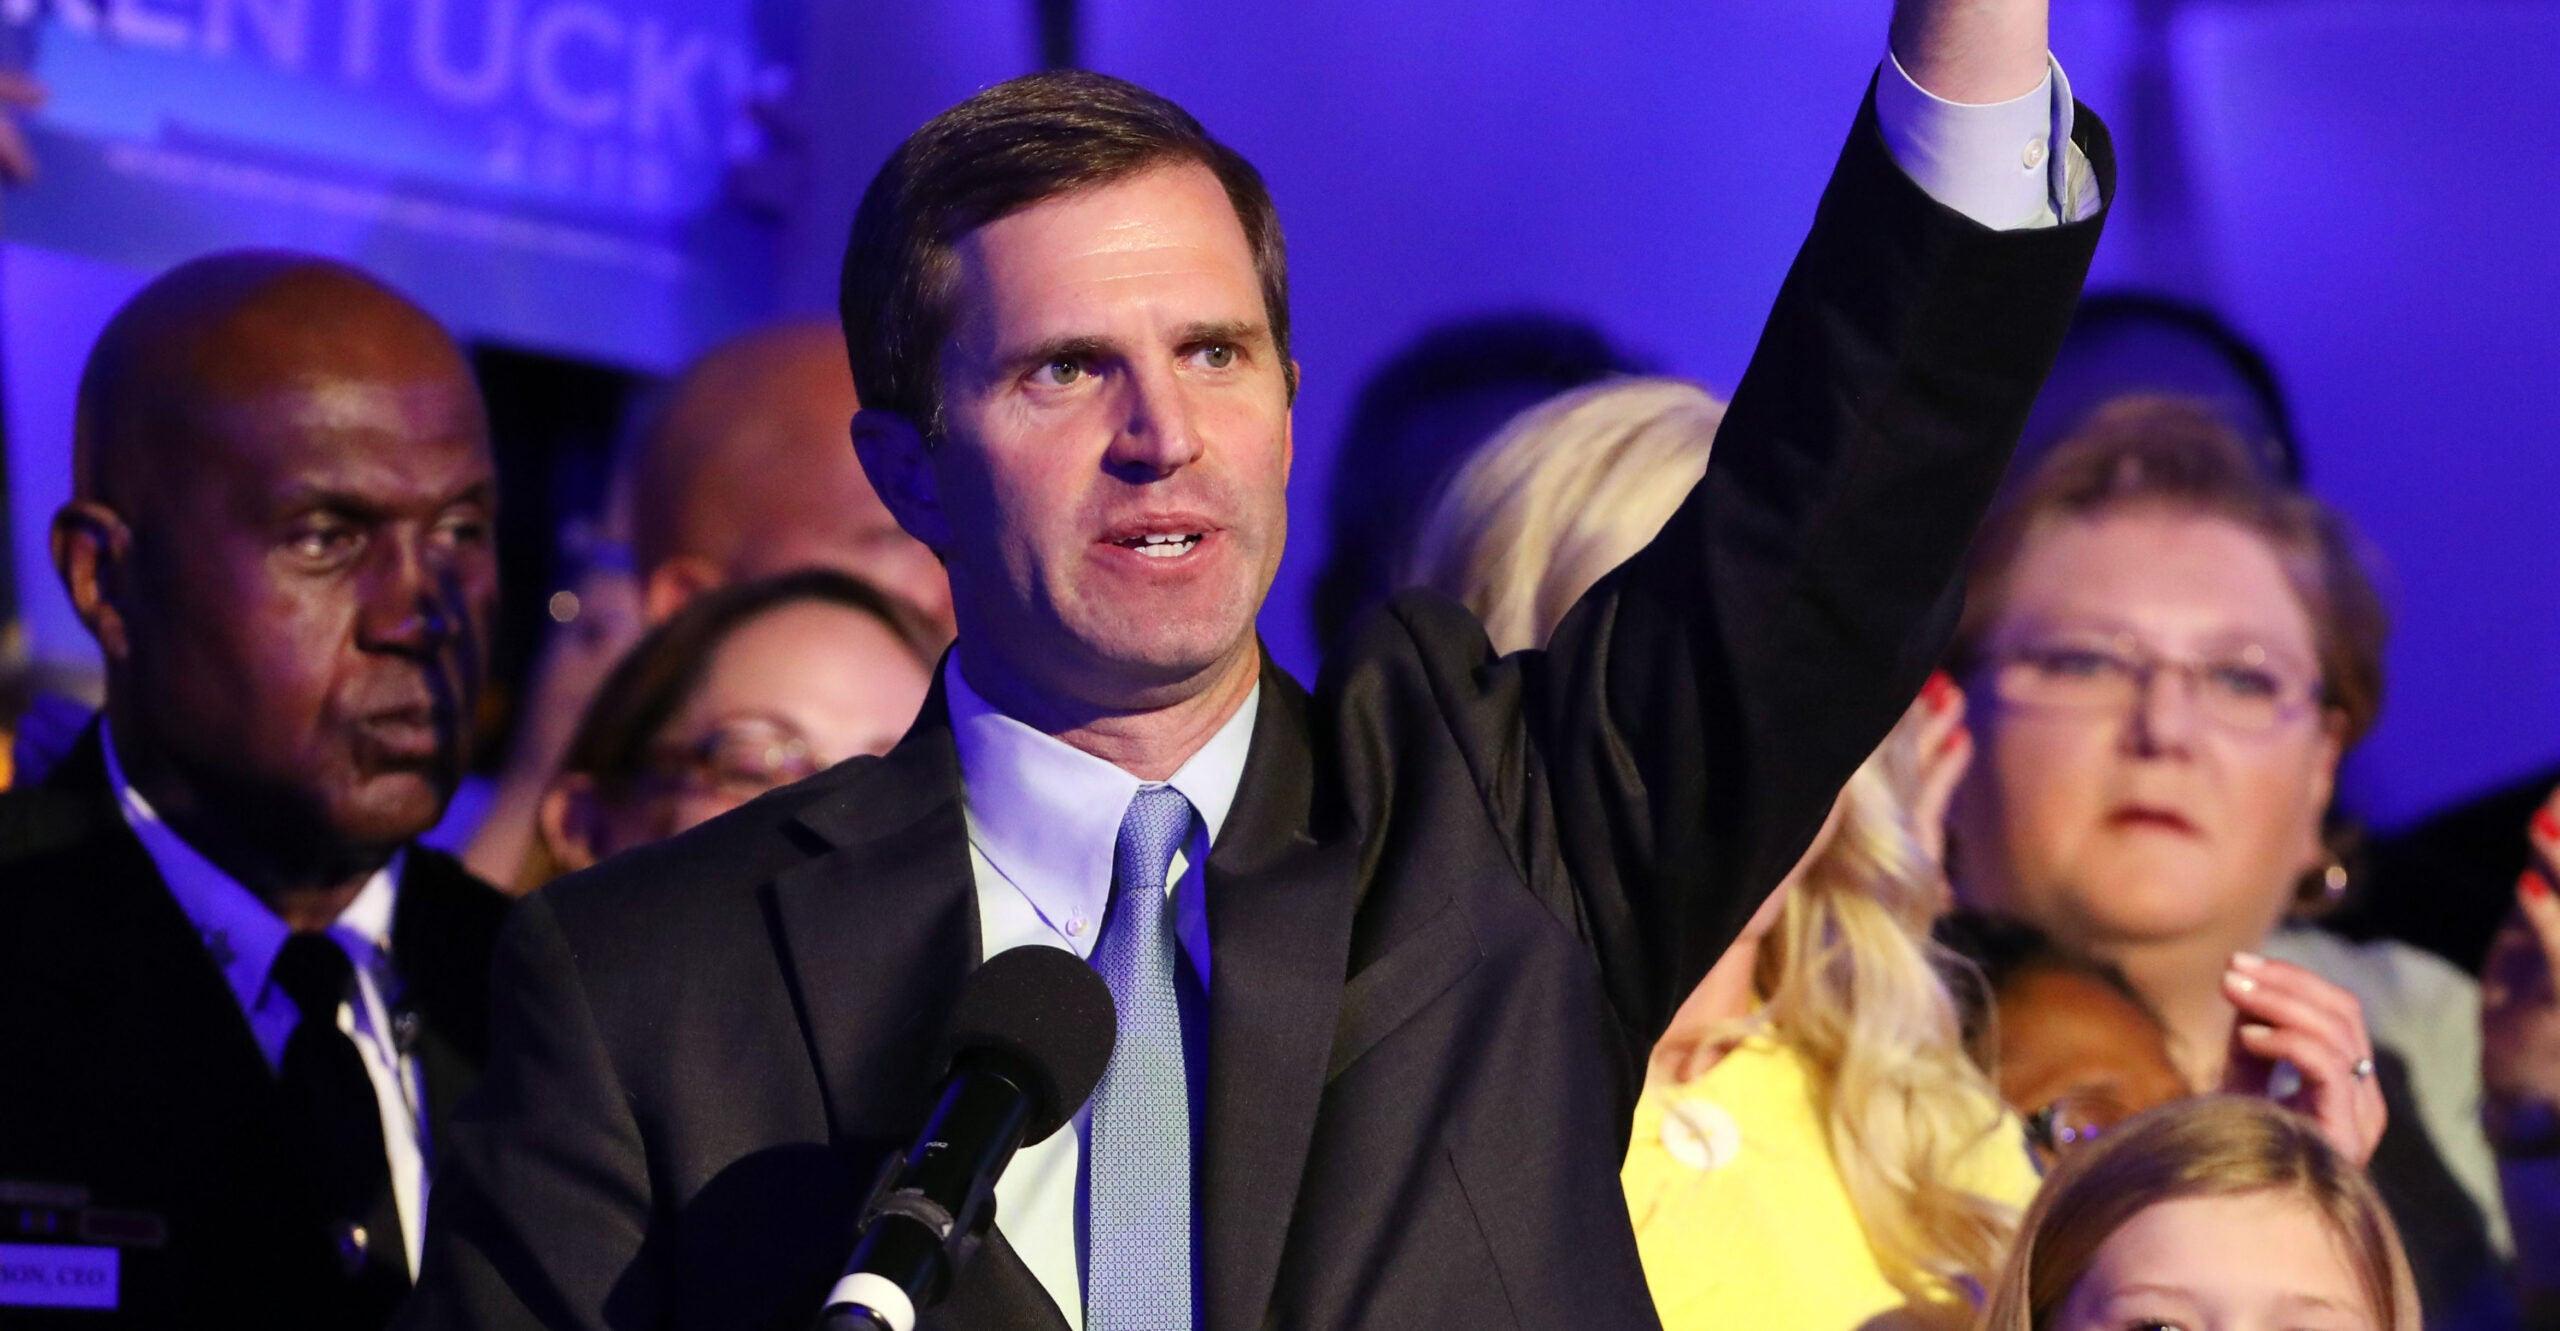 This Governor Faces Impeachment Over COVID-19 Mandates